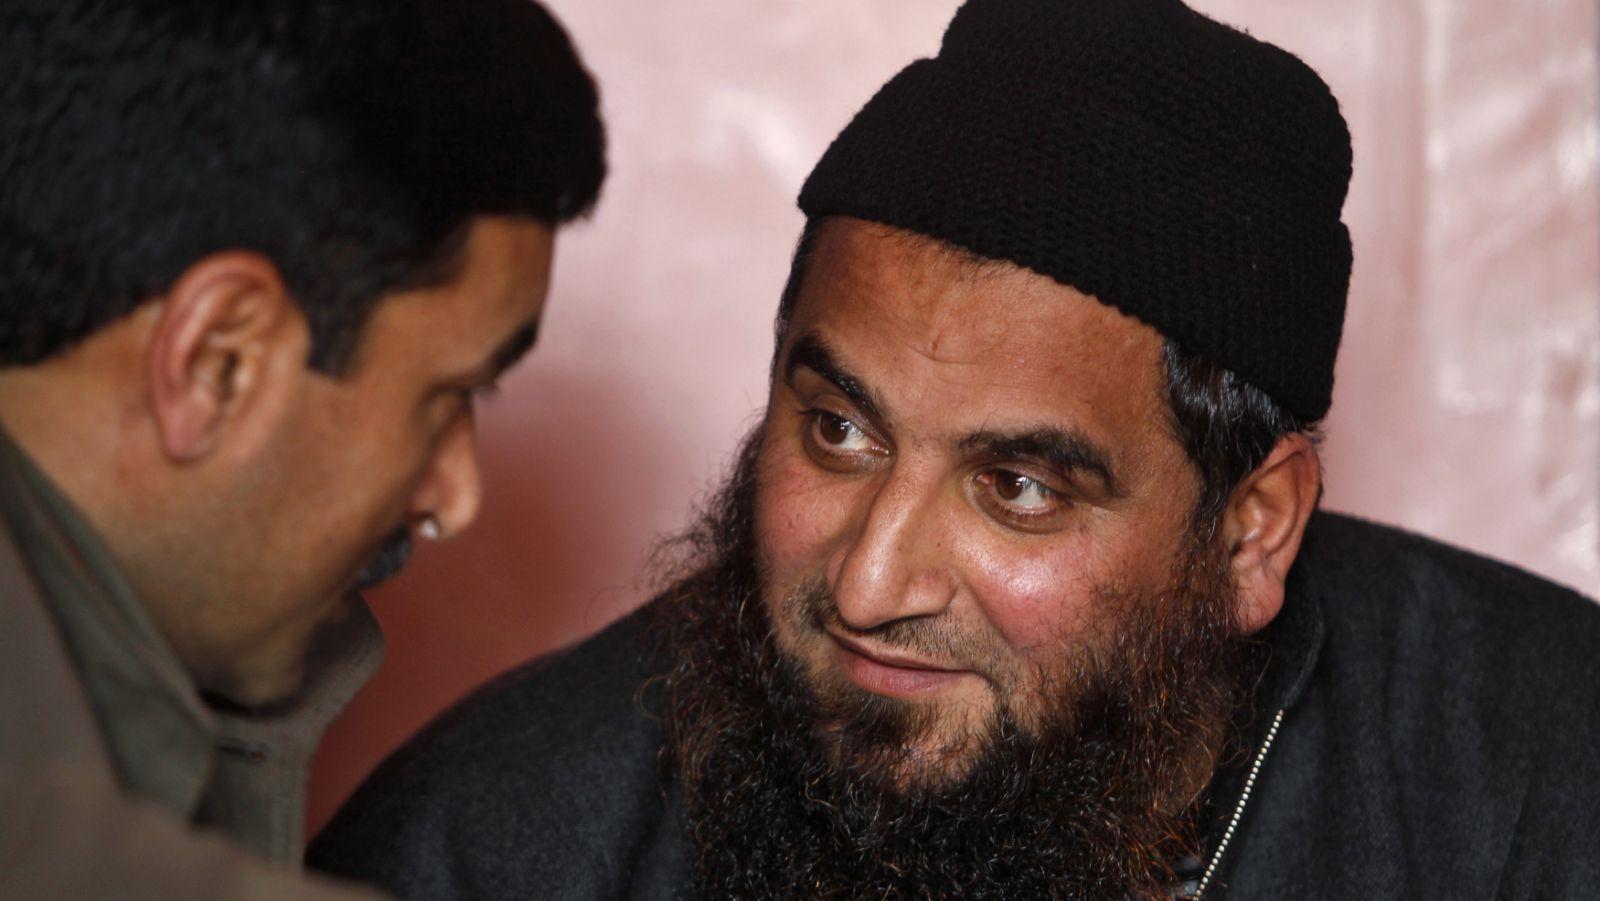 Masarat-Alam-Bhat-Modi-India-Kashmir